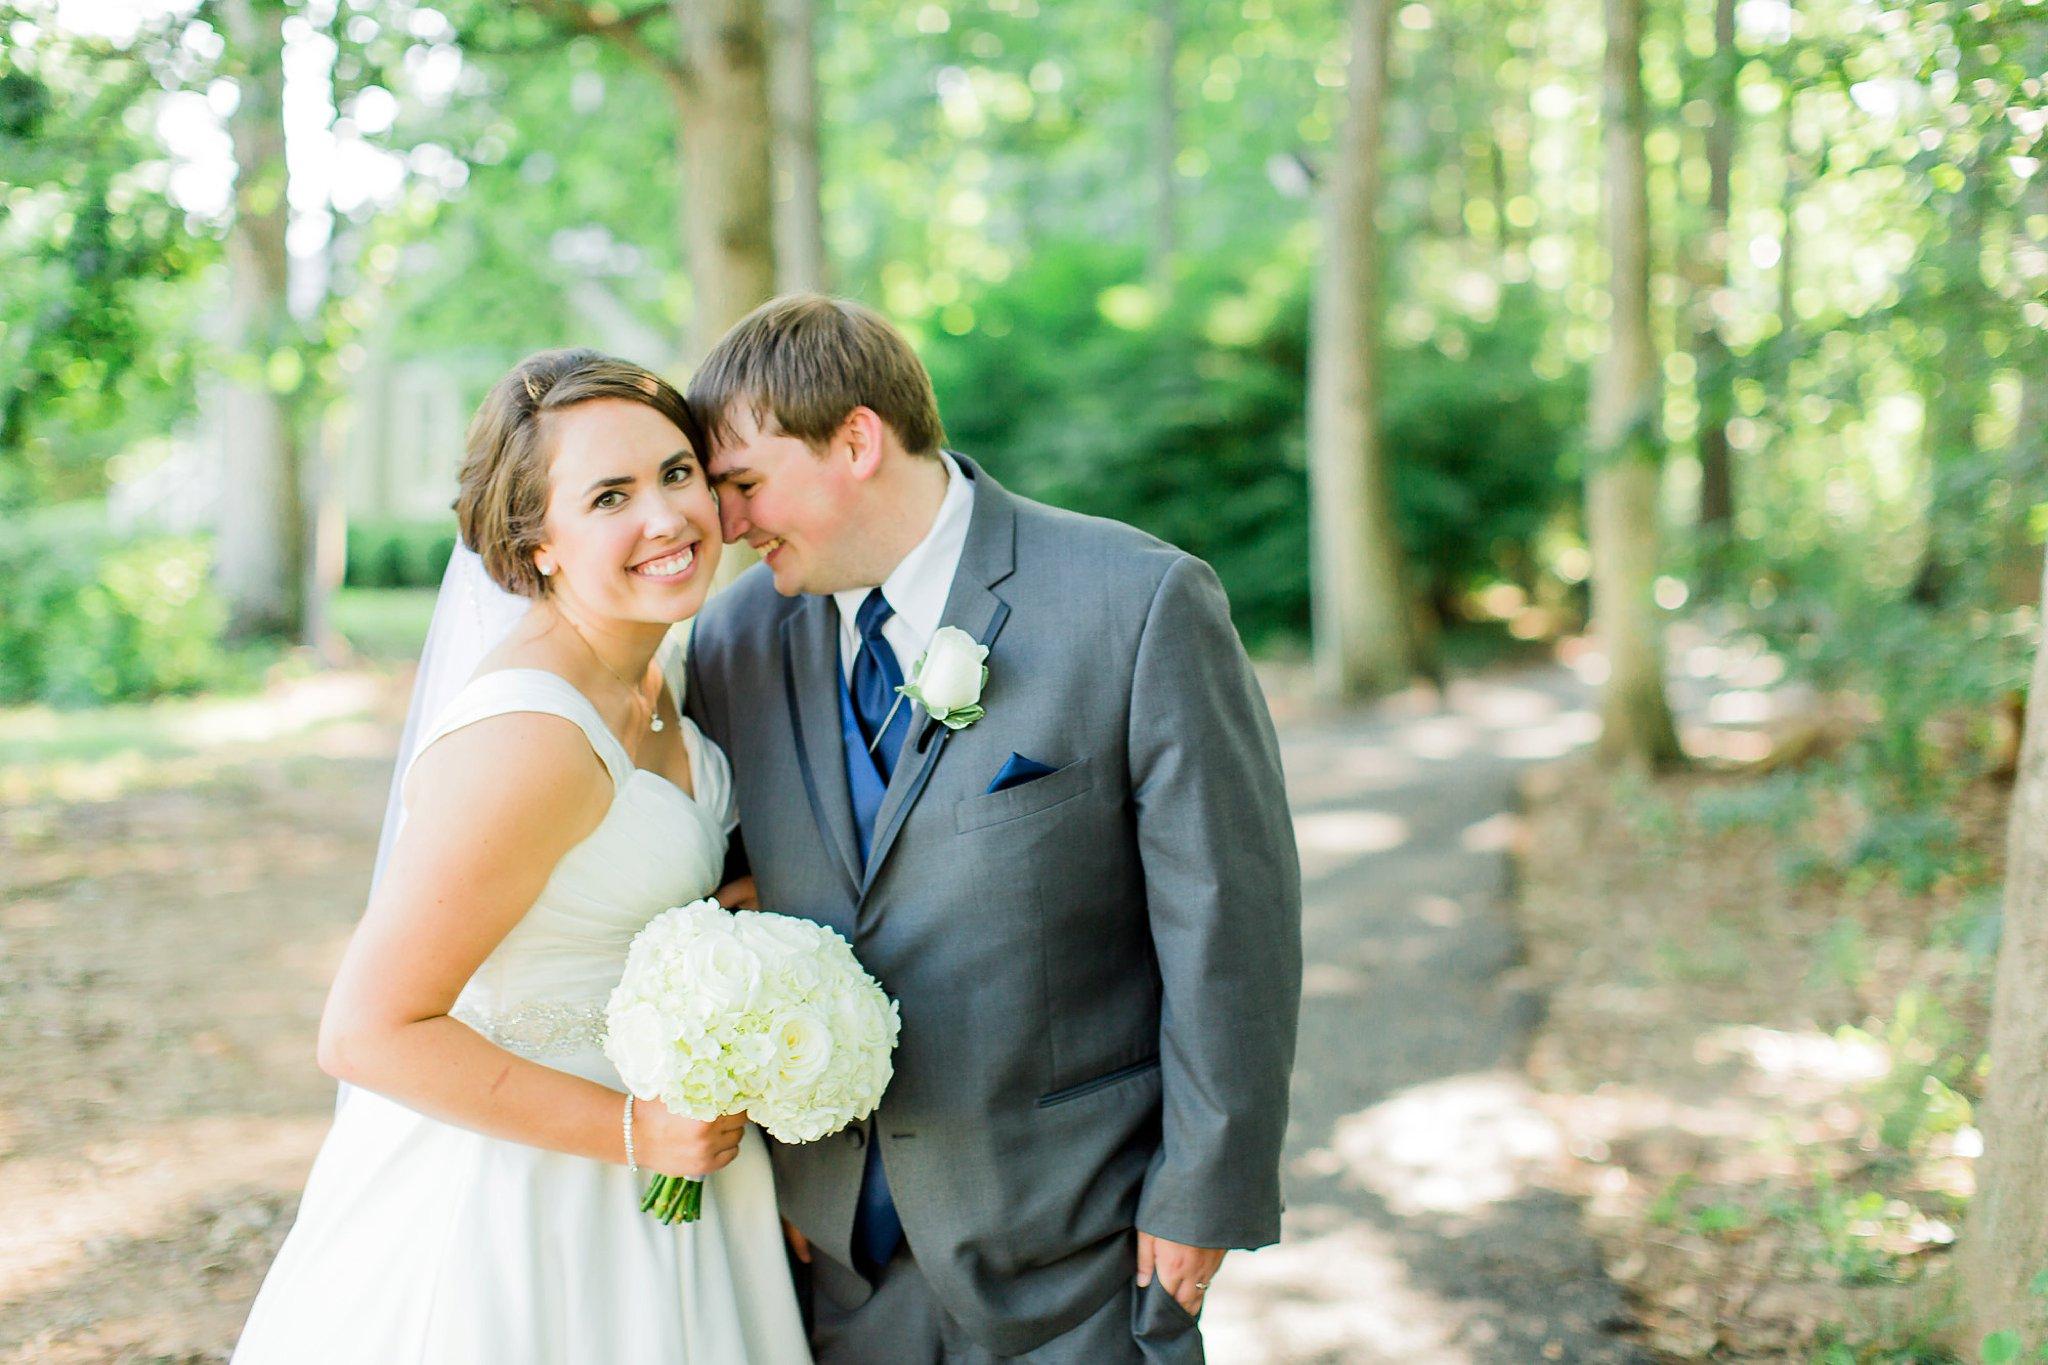 Waterford Fair Oaks Wedding Photos Northern Virginia Wedding Photographer Megan Kelsey Photography Lindsay & Joey-130.jpg